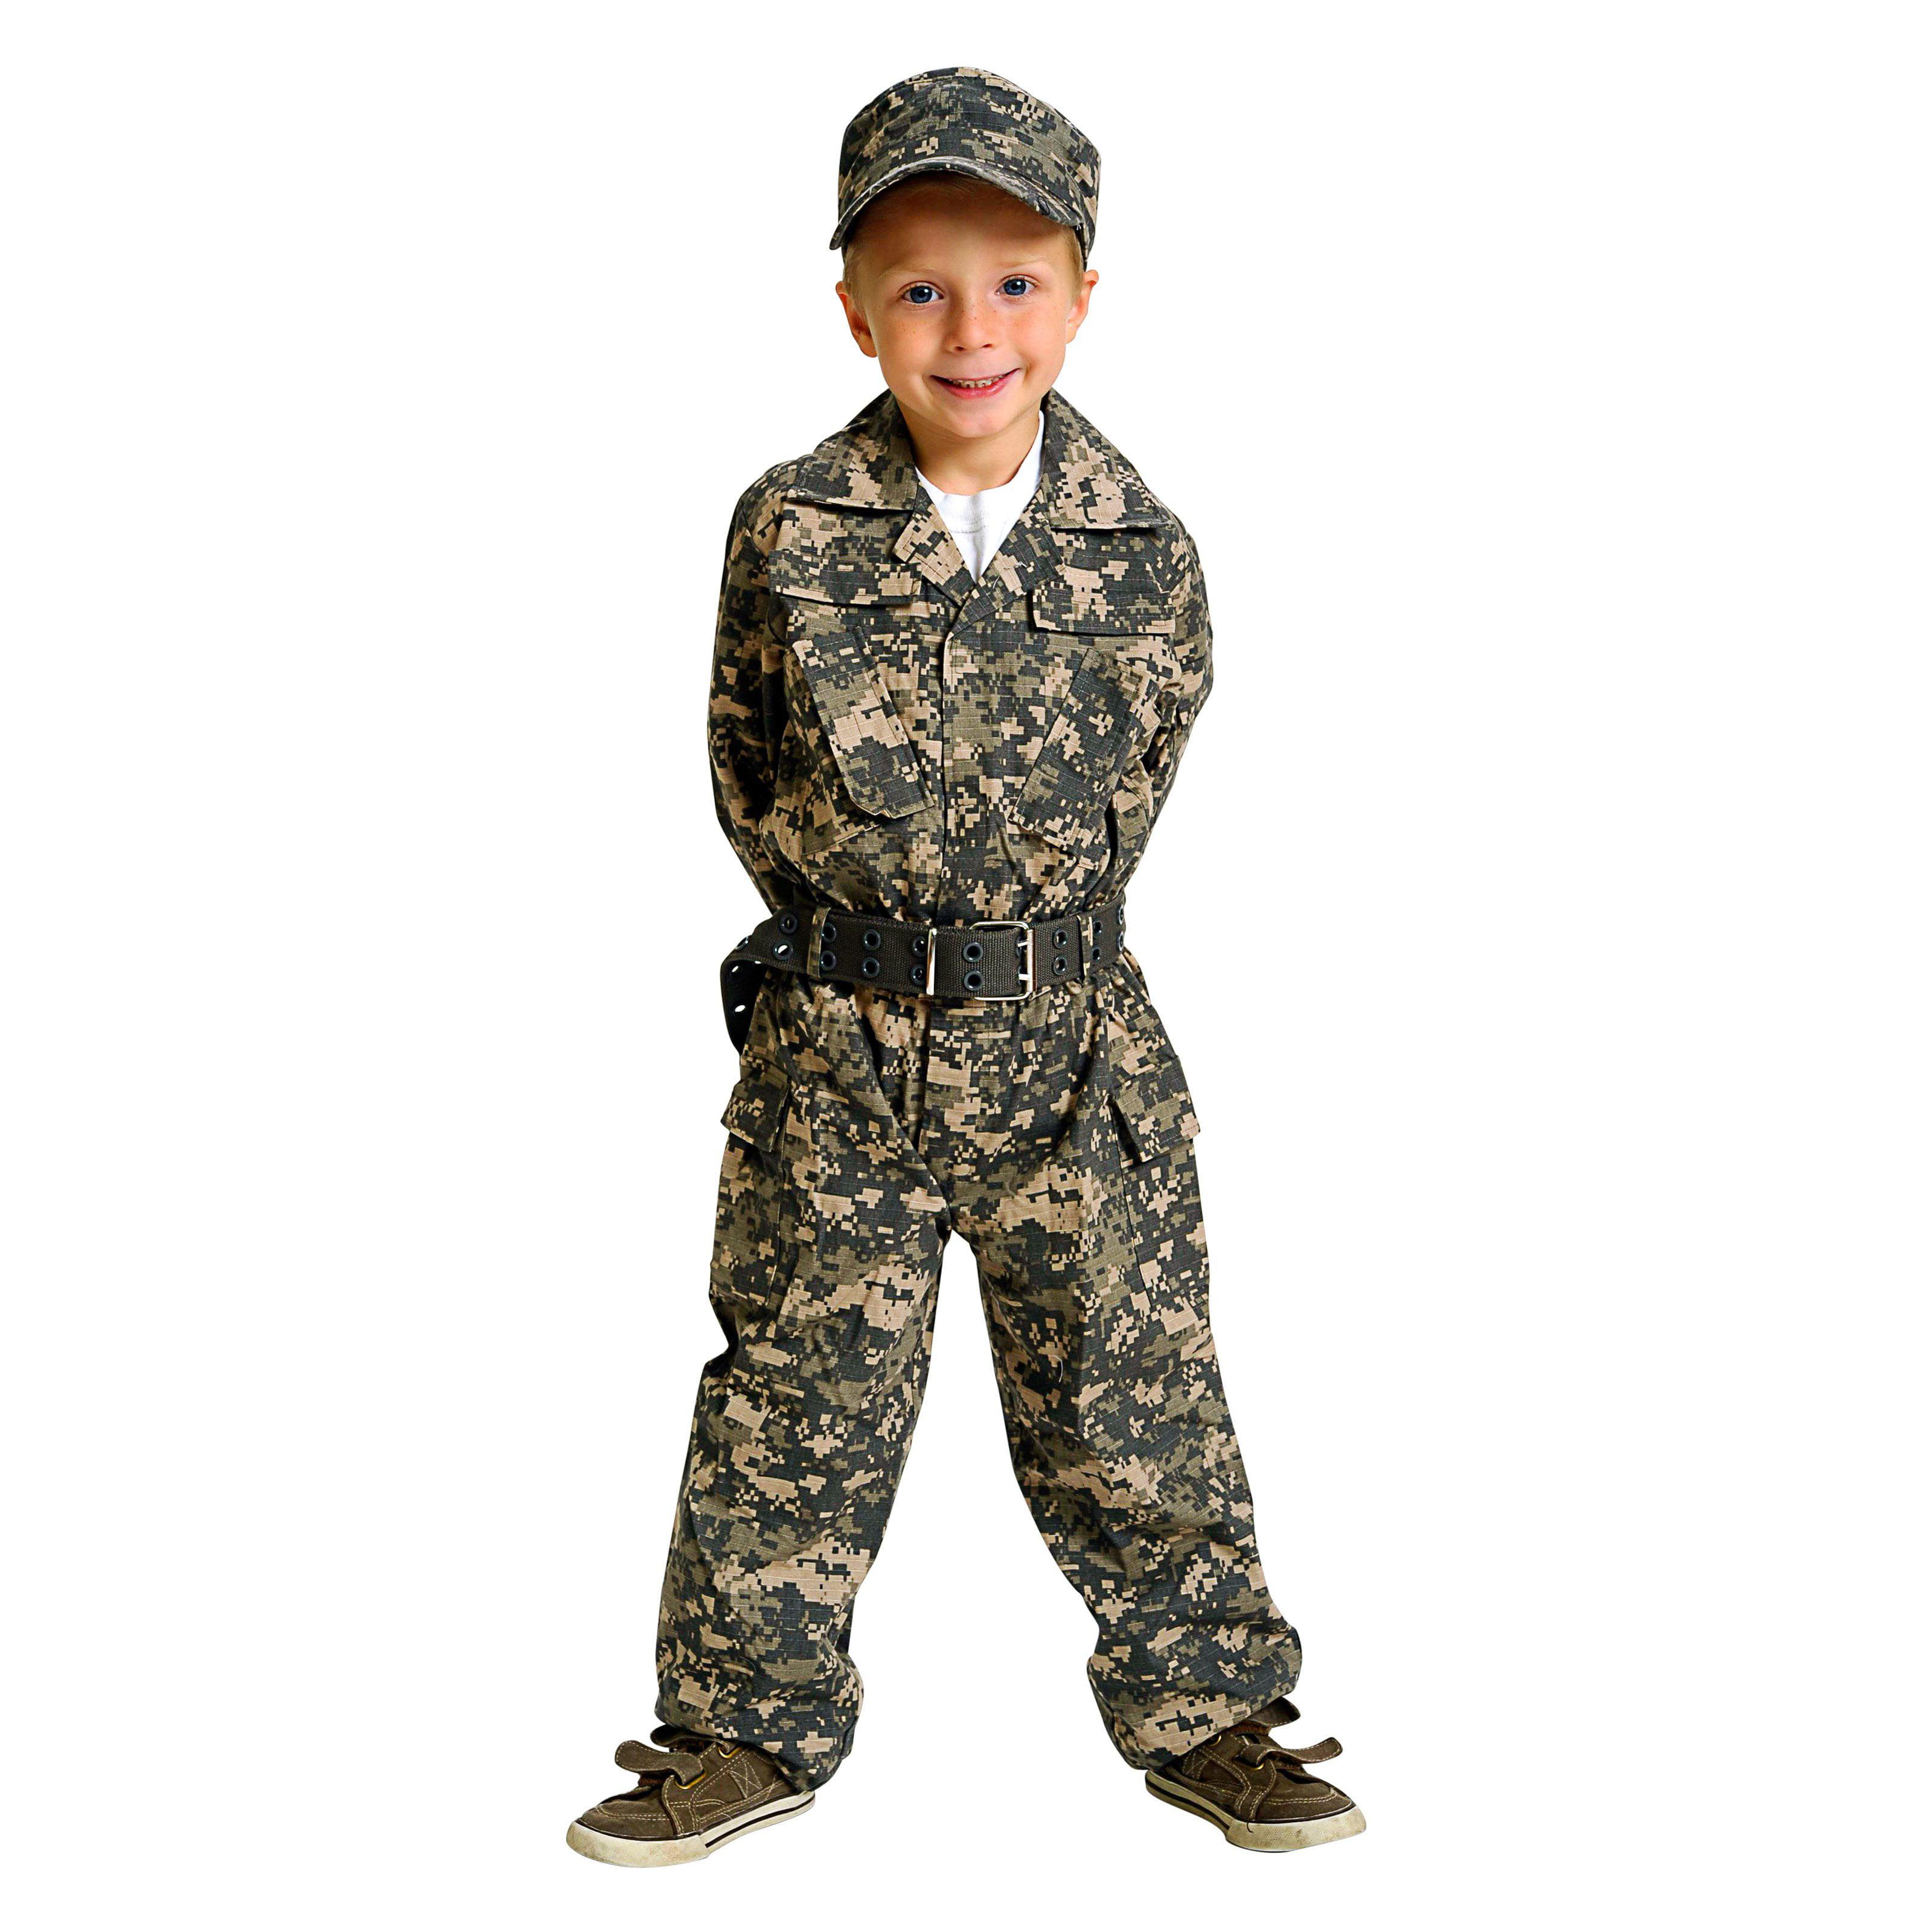 Aeromax Jr. Camouflage Suit